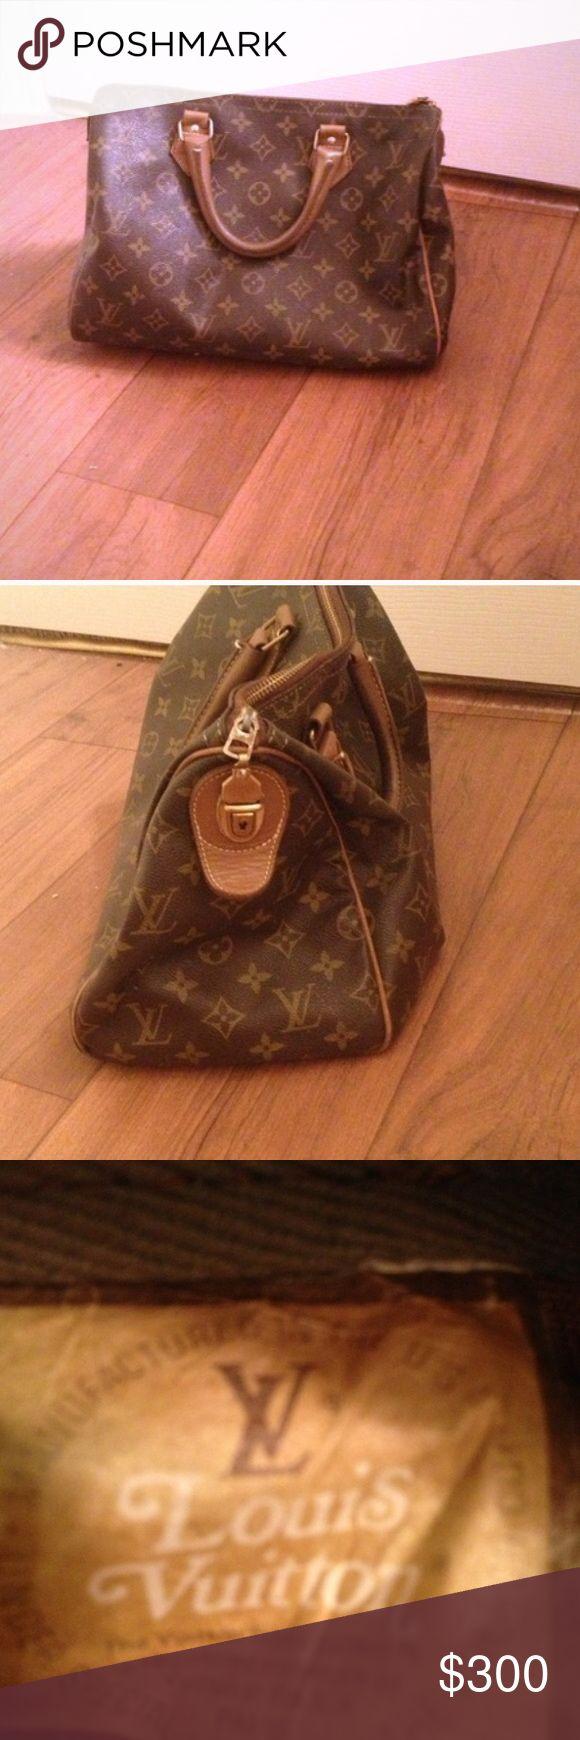 Louis Vuitton speedy bag vintage 1980s Louis Vuitton speedy bag vintage Louis Vuitton Bags Totes